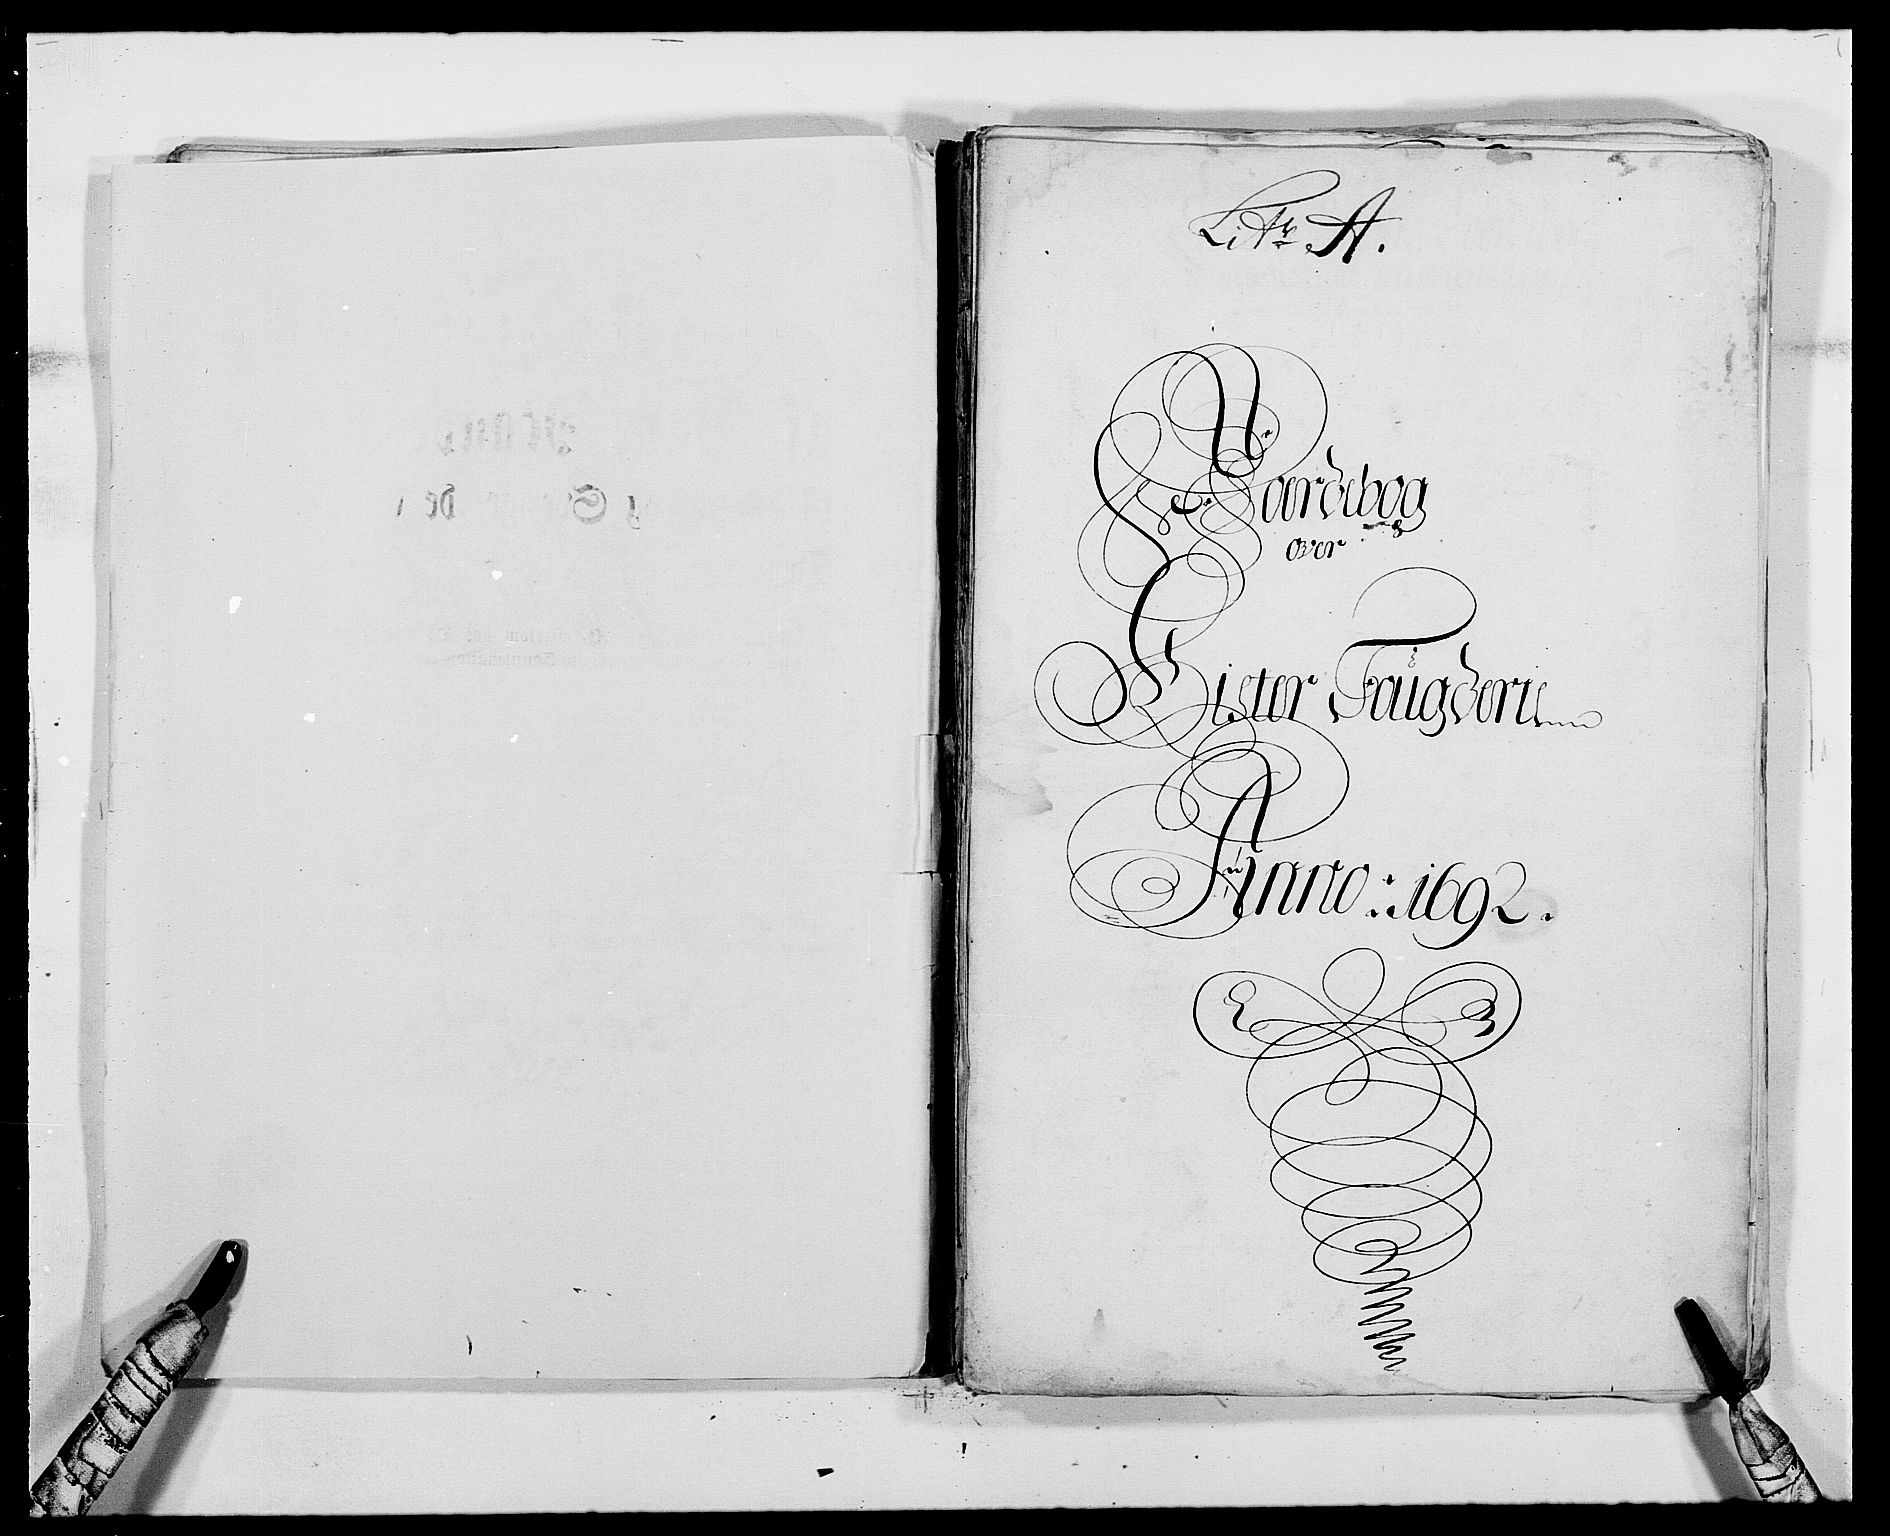 RA, Rentekammeret inntil 1814, Reviderte regnskaper, Fogderegnskap, R41/L2536: Fogderegnskap Lista, 1690-1693, s. 200